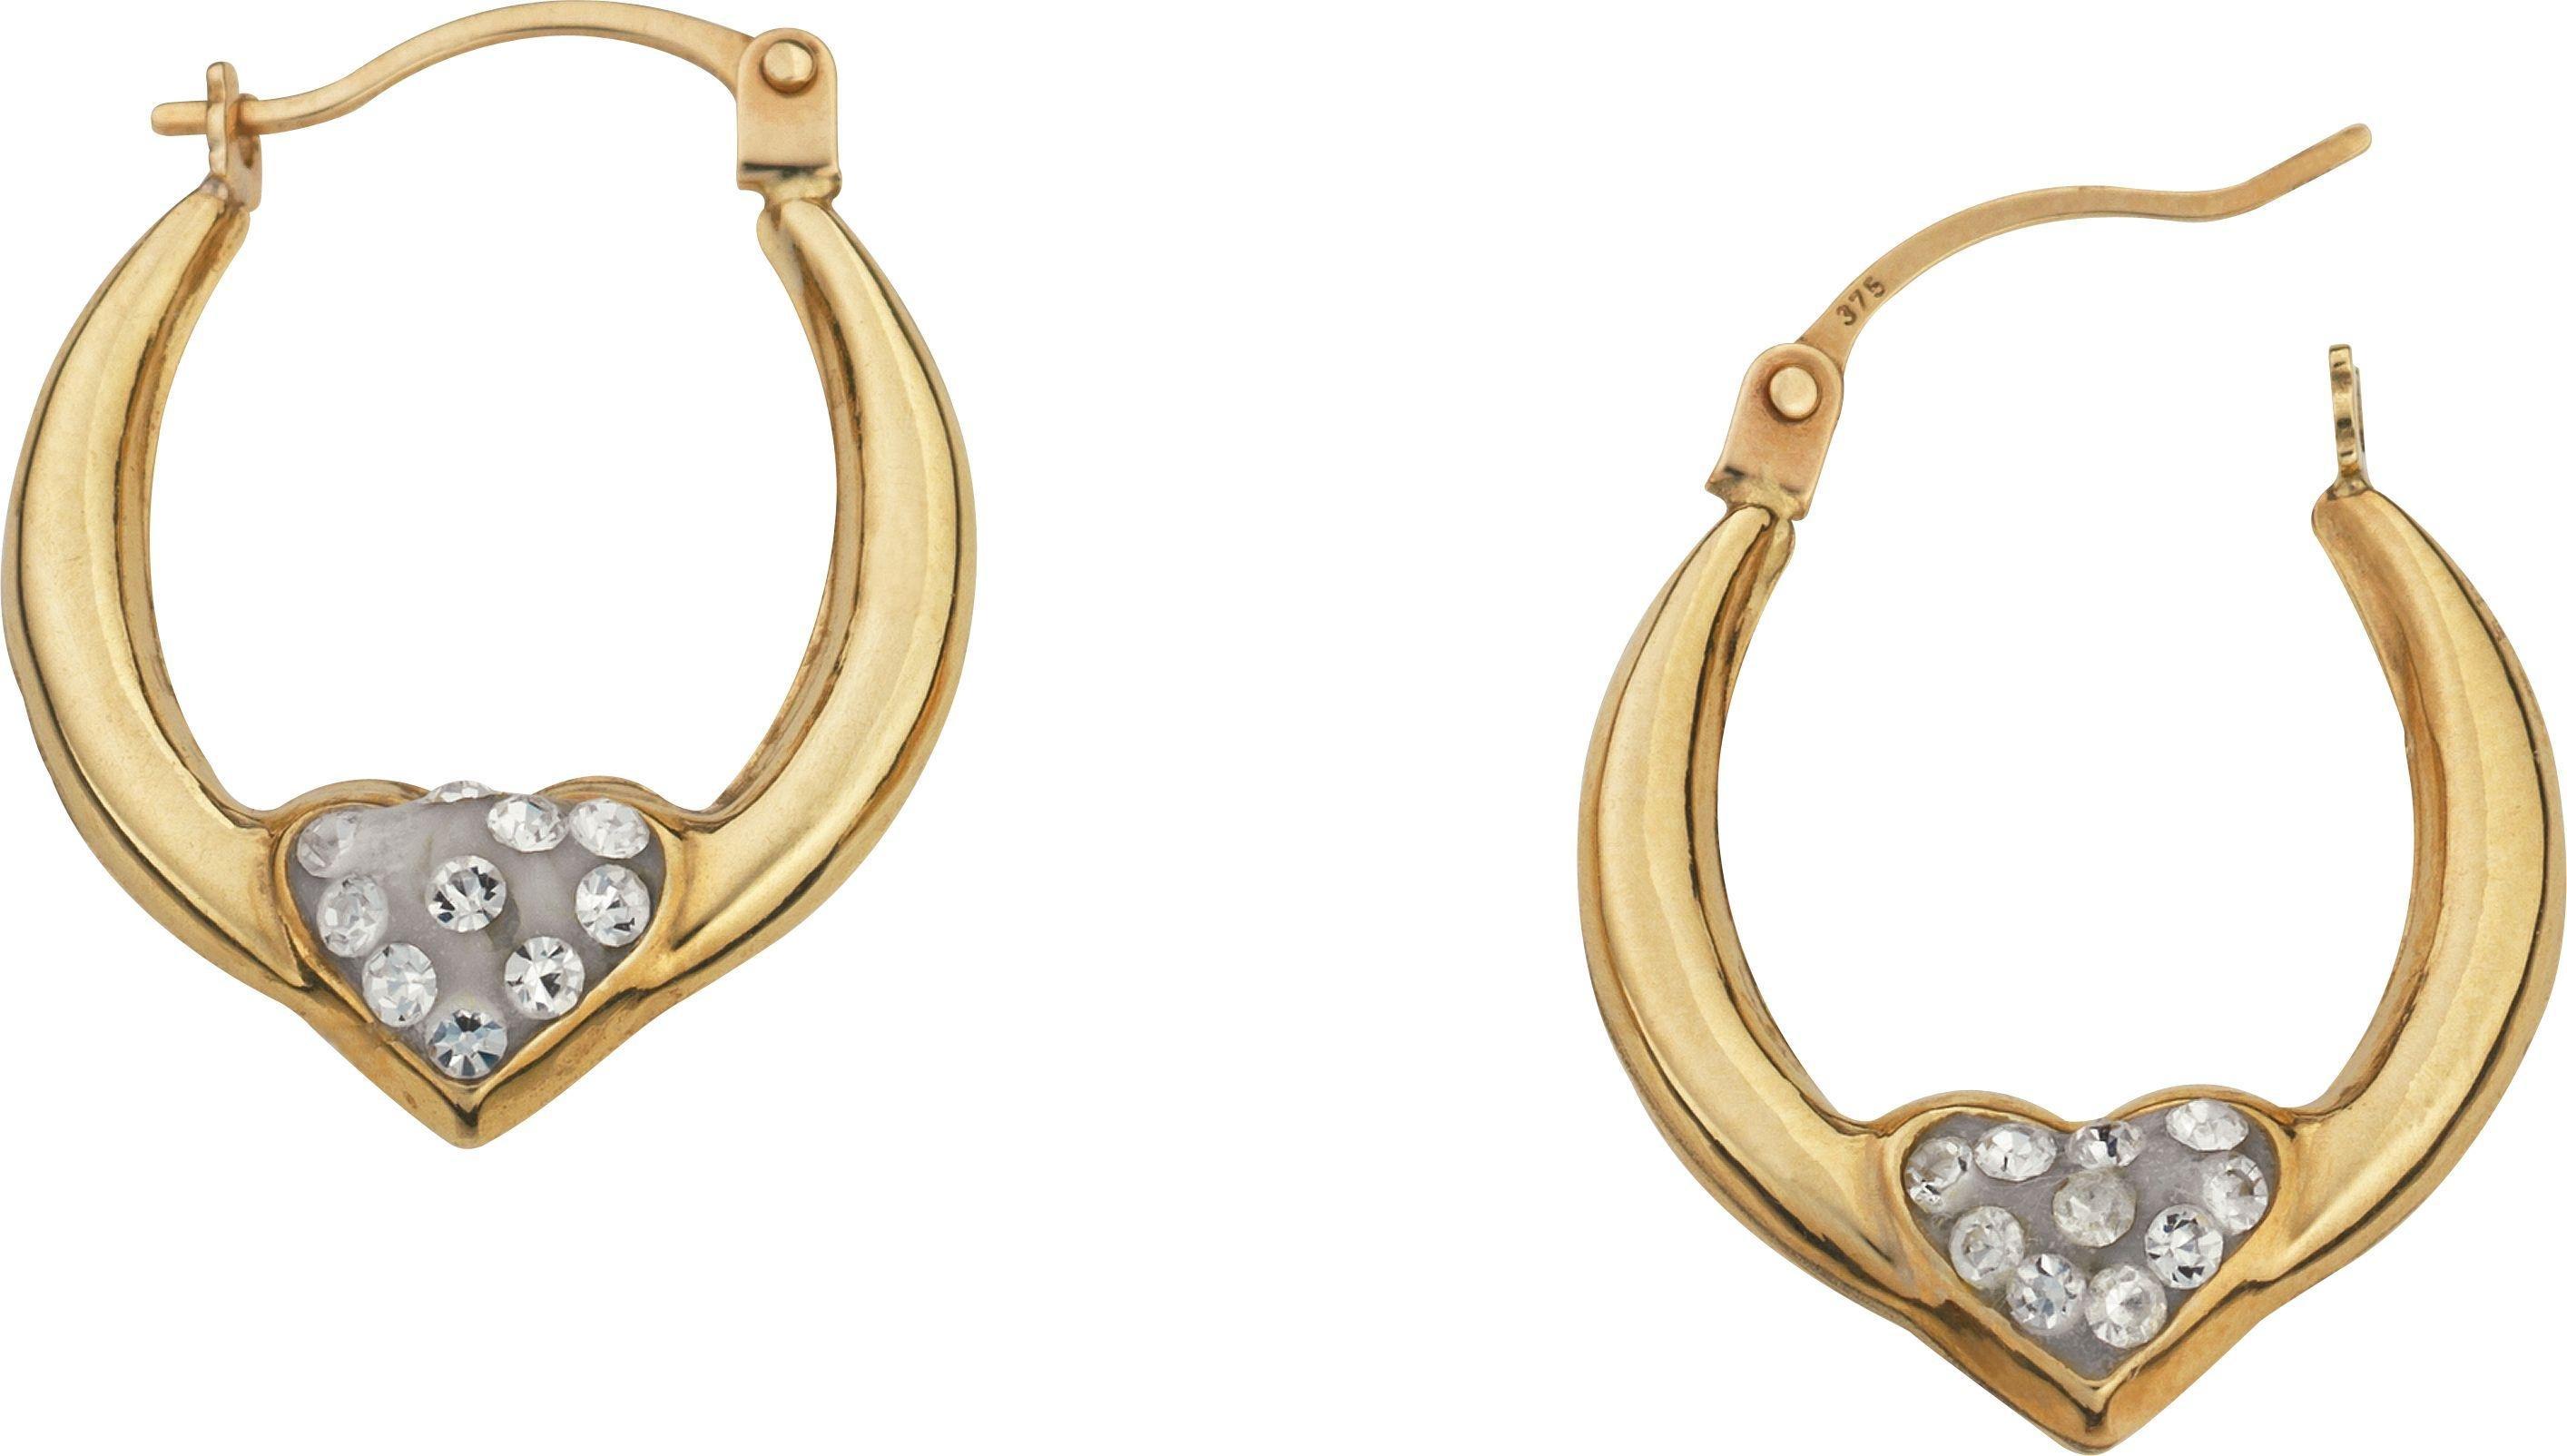 9 Carat Gold - Reversible Crystal Heart Creole Earrings.